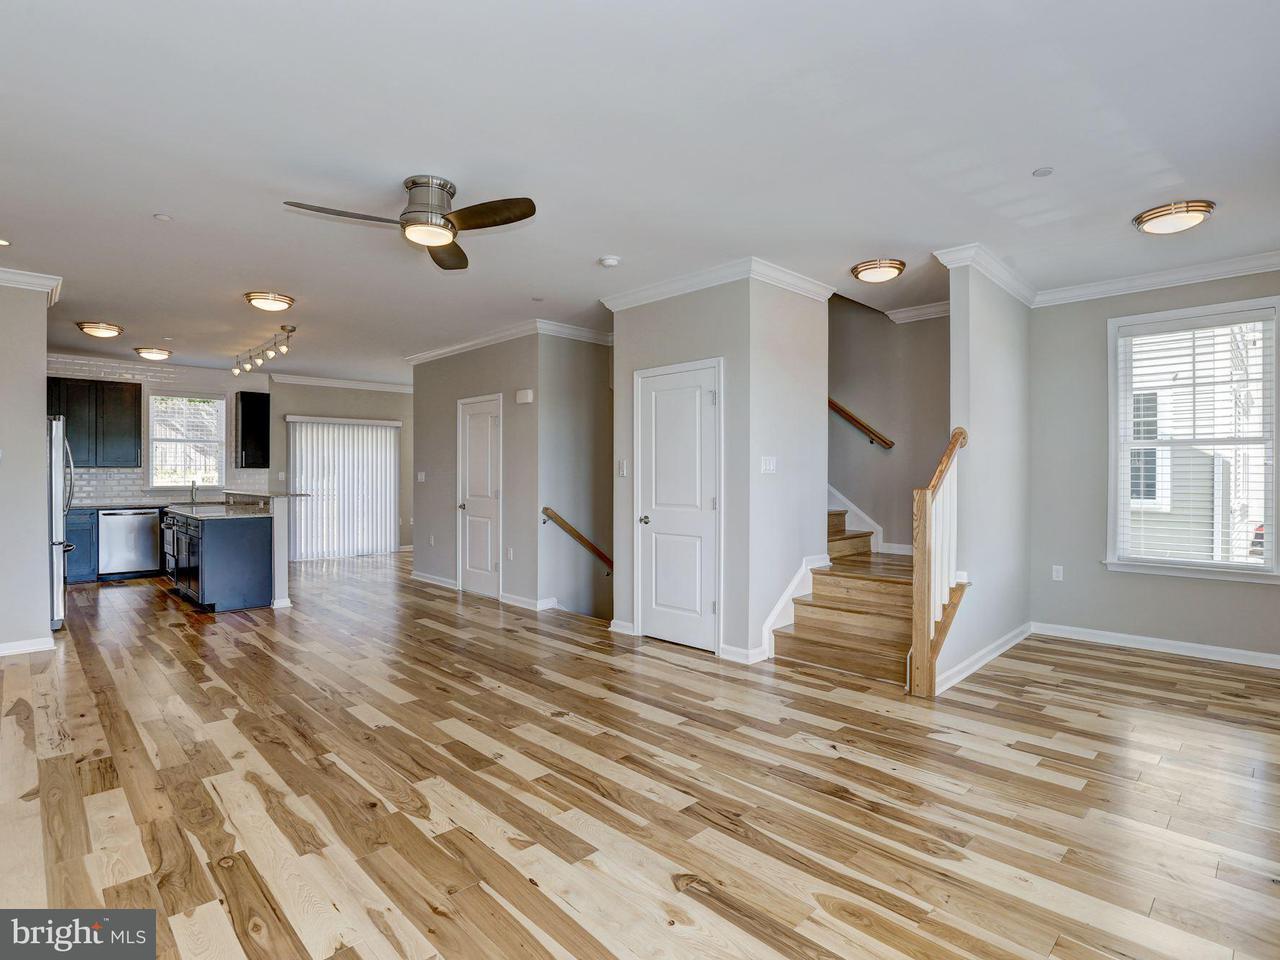 Additional photo for property listing at 437 WOODCREST DR SE 437 WOODCREST DR SE Washington, District Of Columbia 20032 United States